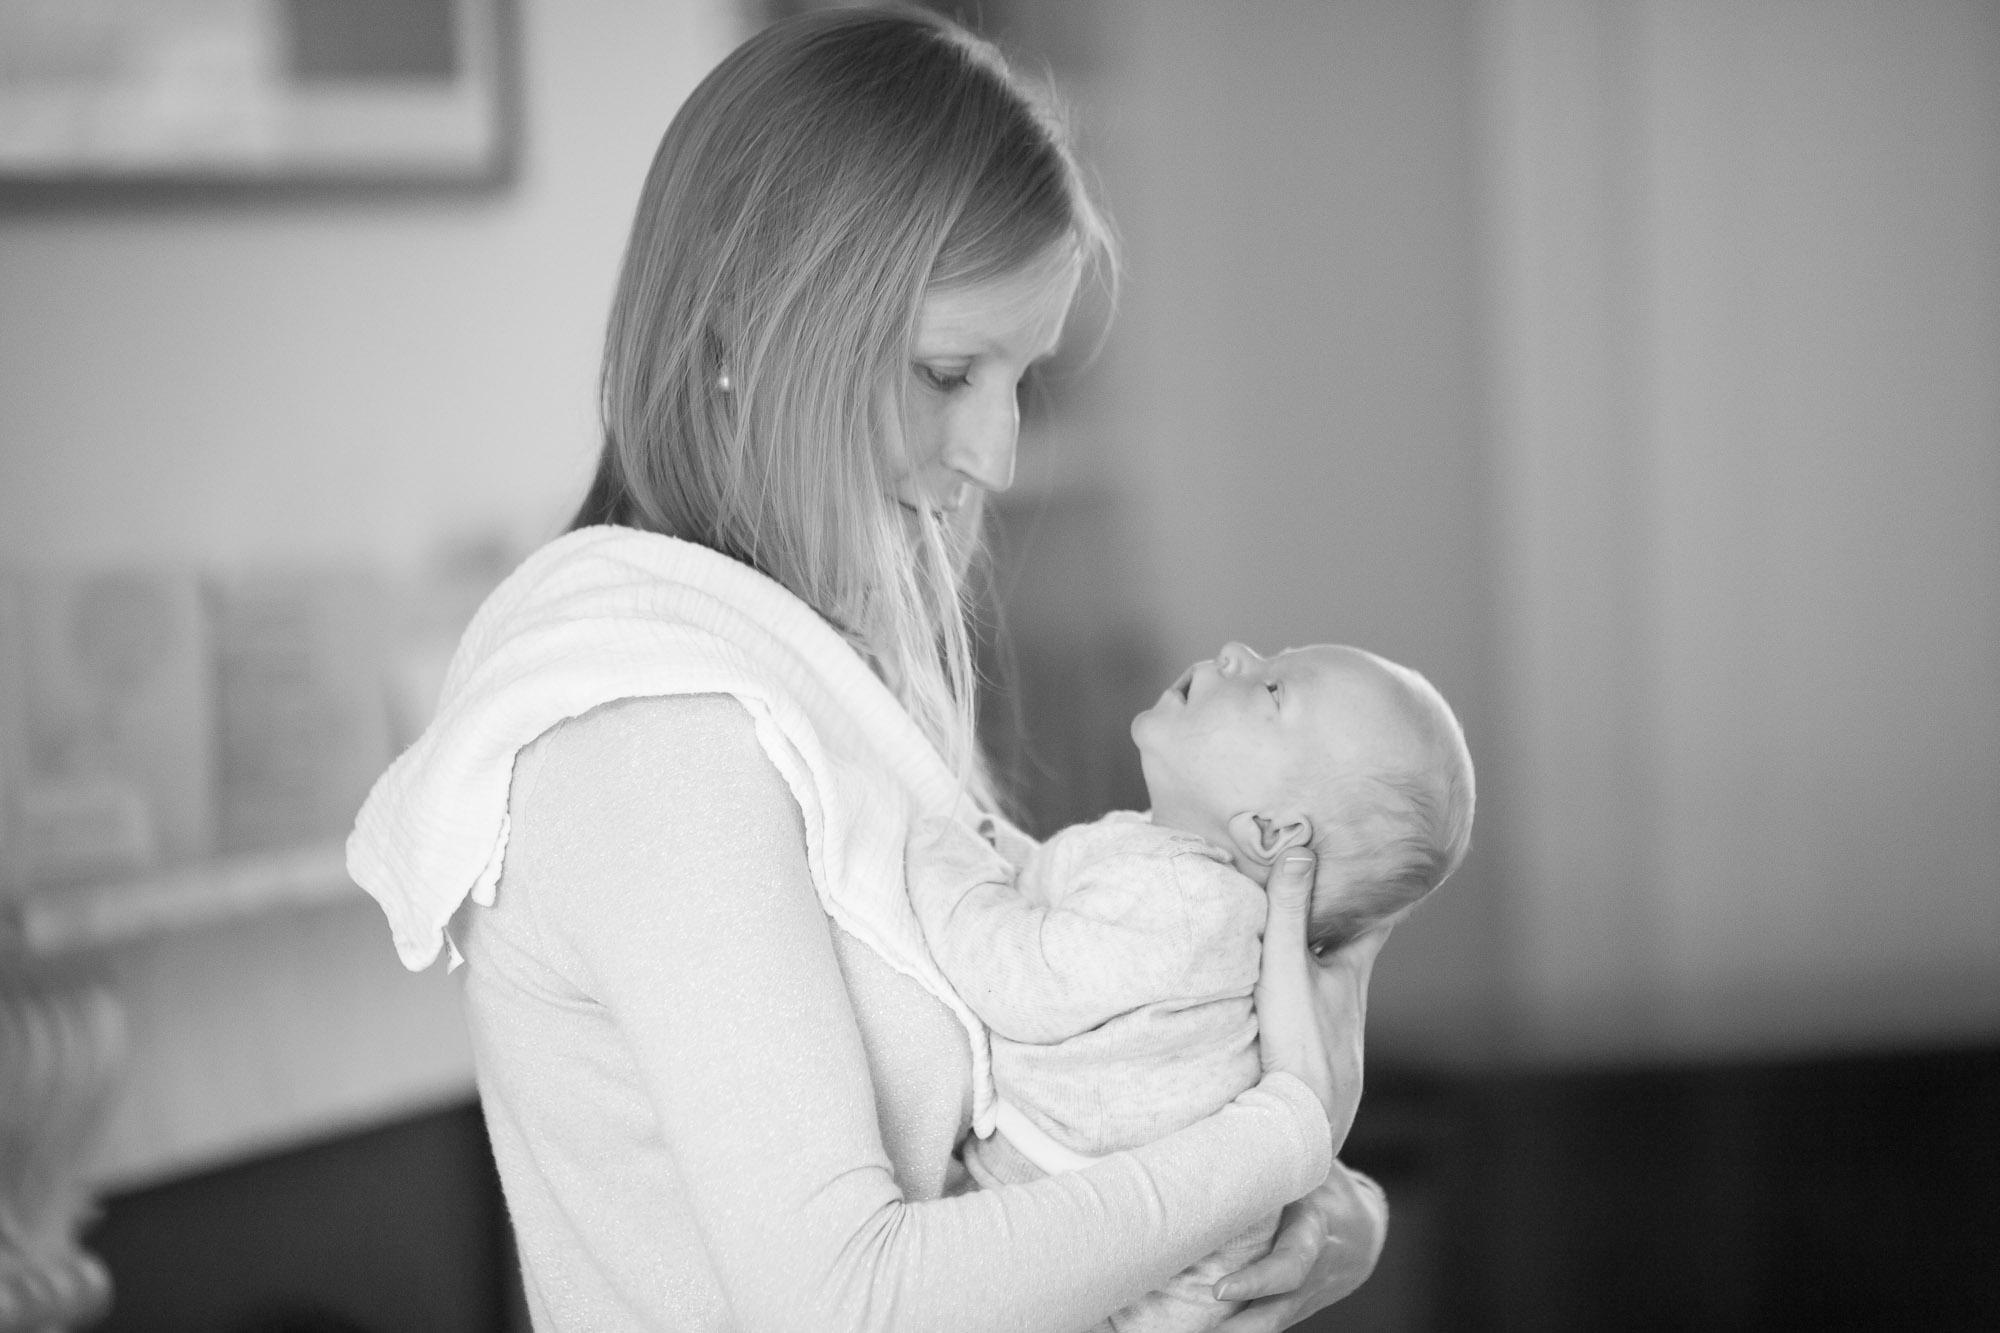 newborn-baby-family-portrait-photographer-007.jpg